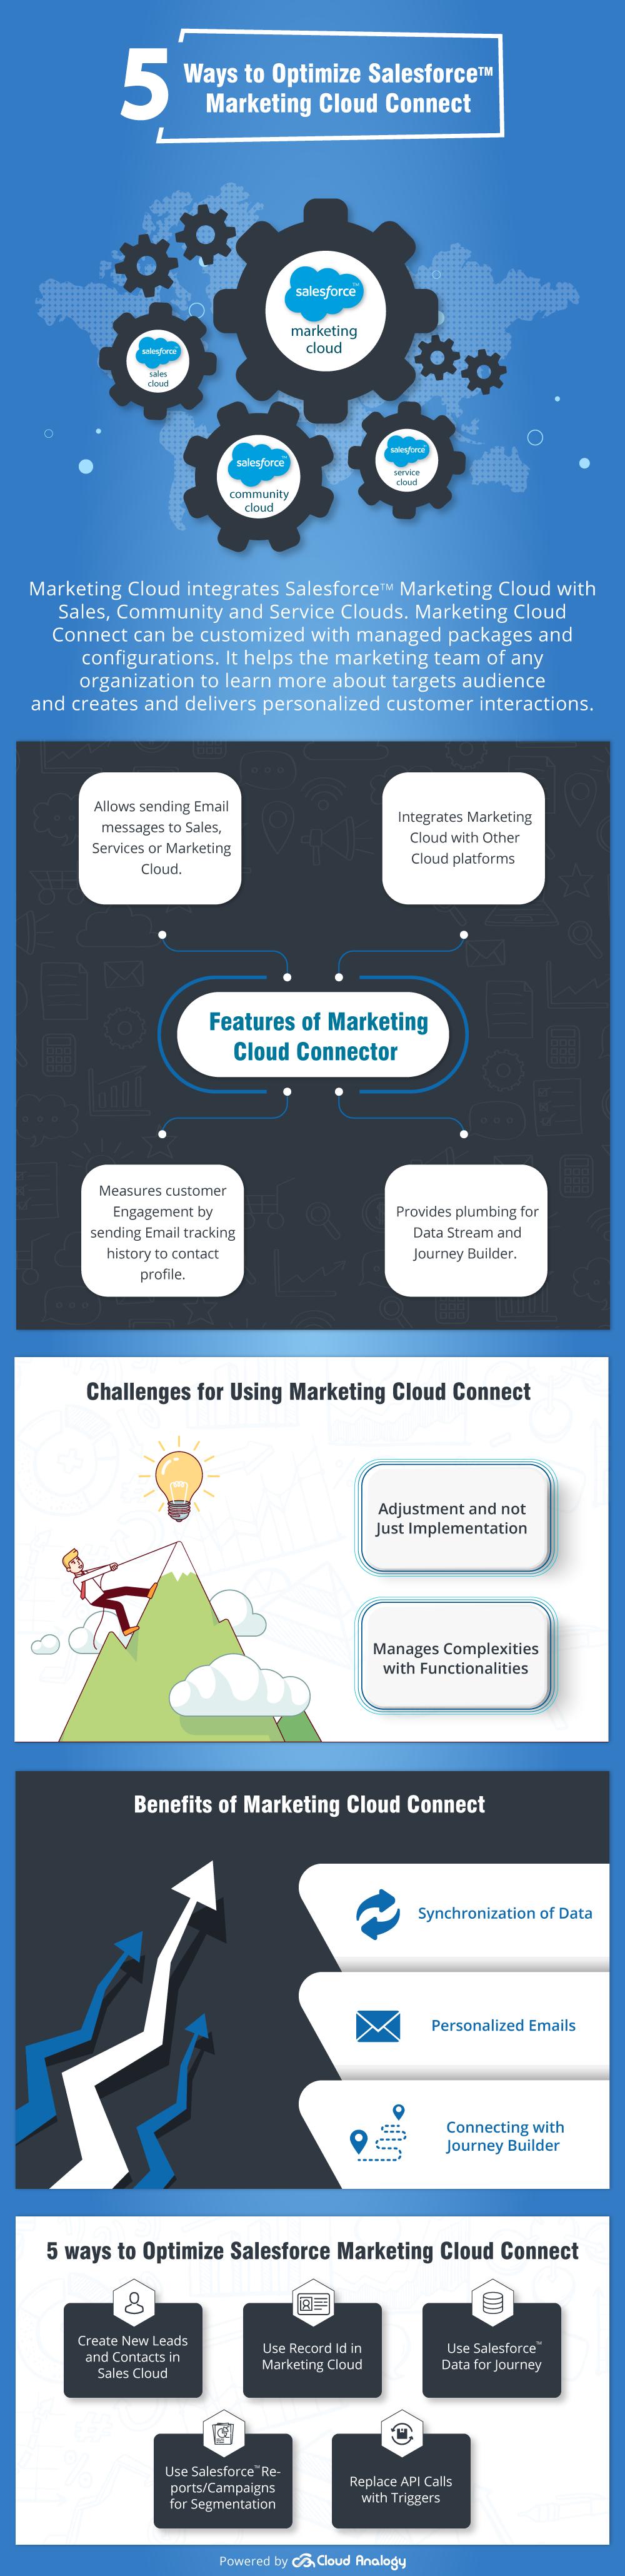 5 ways to optimize Salesforce Marketing Cloud Connect